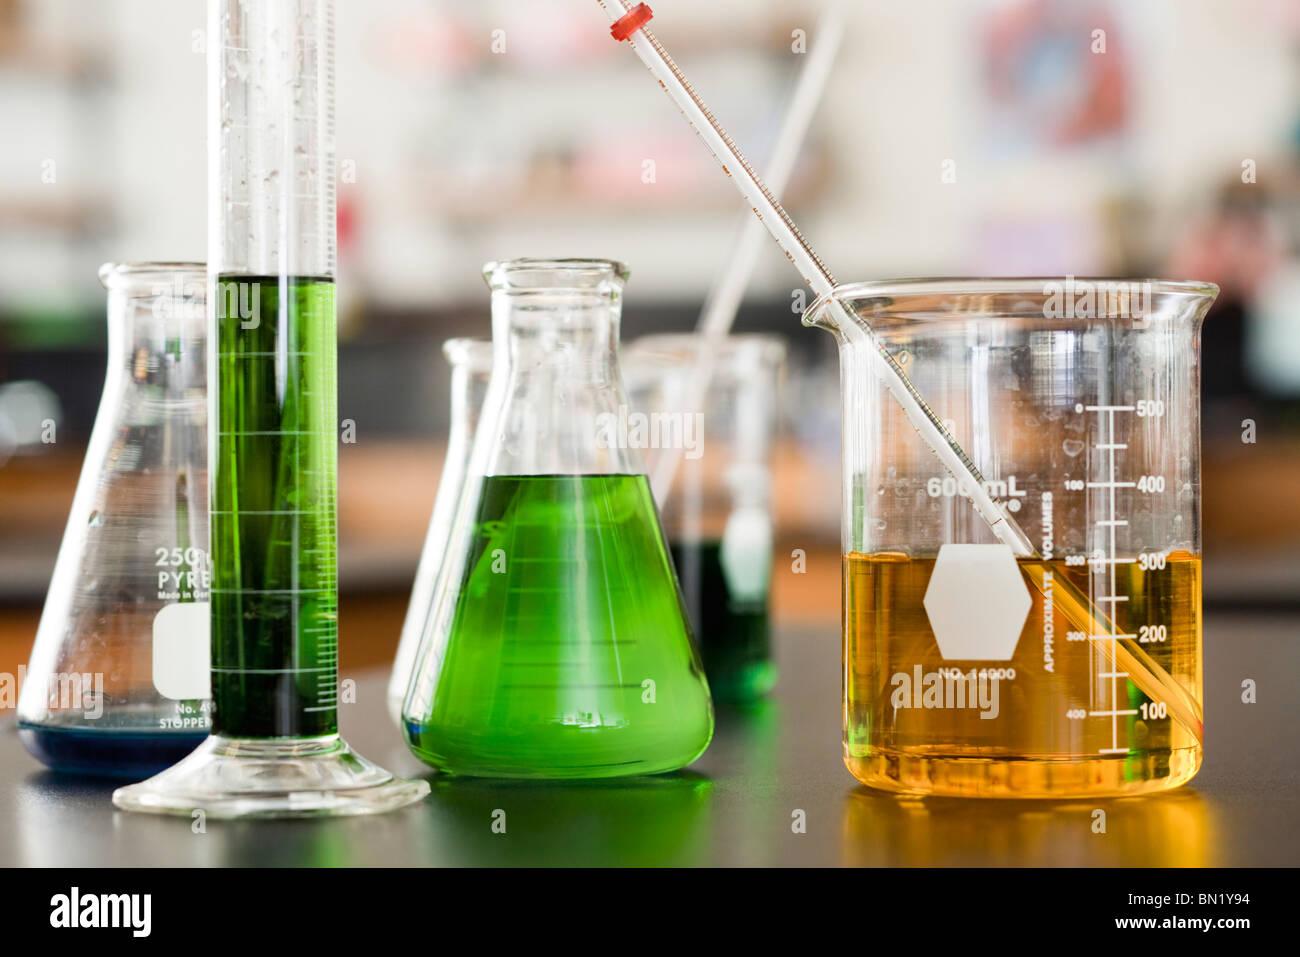 Chemicals in beakers - Stock Image